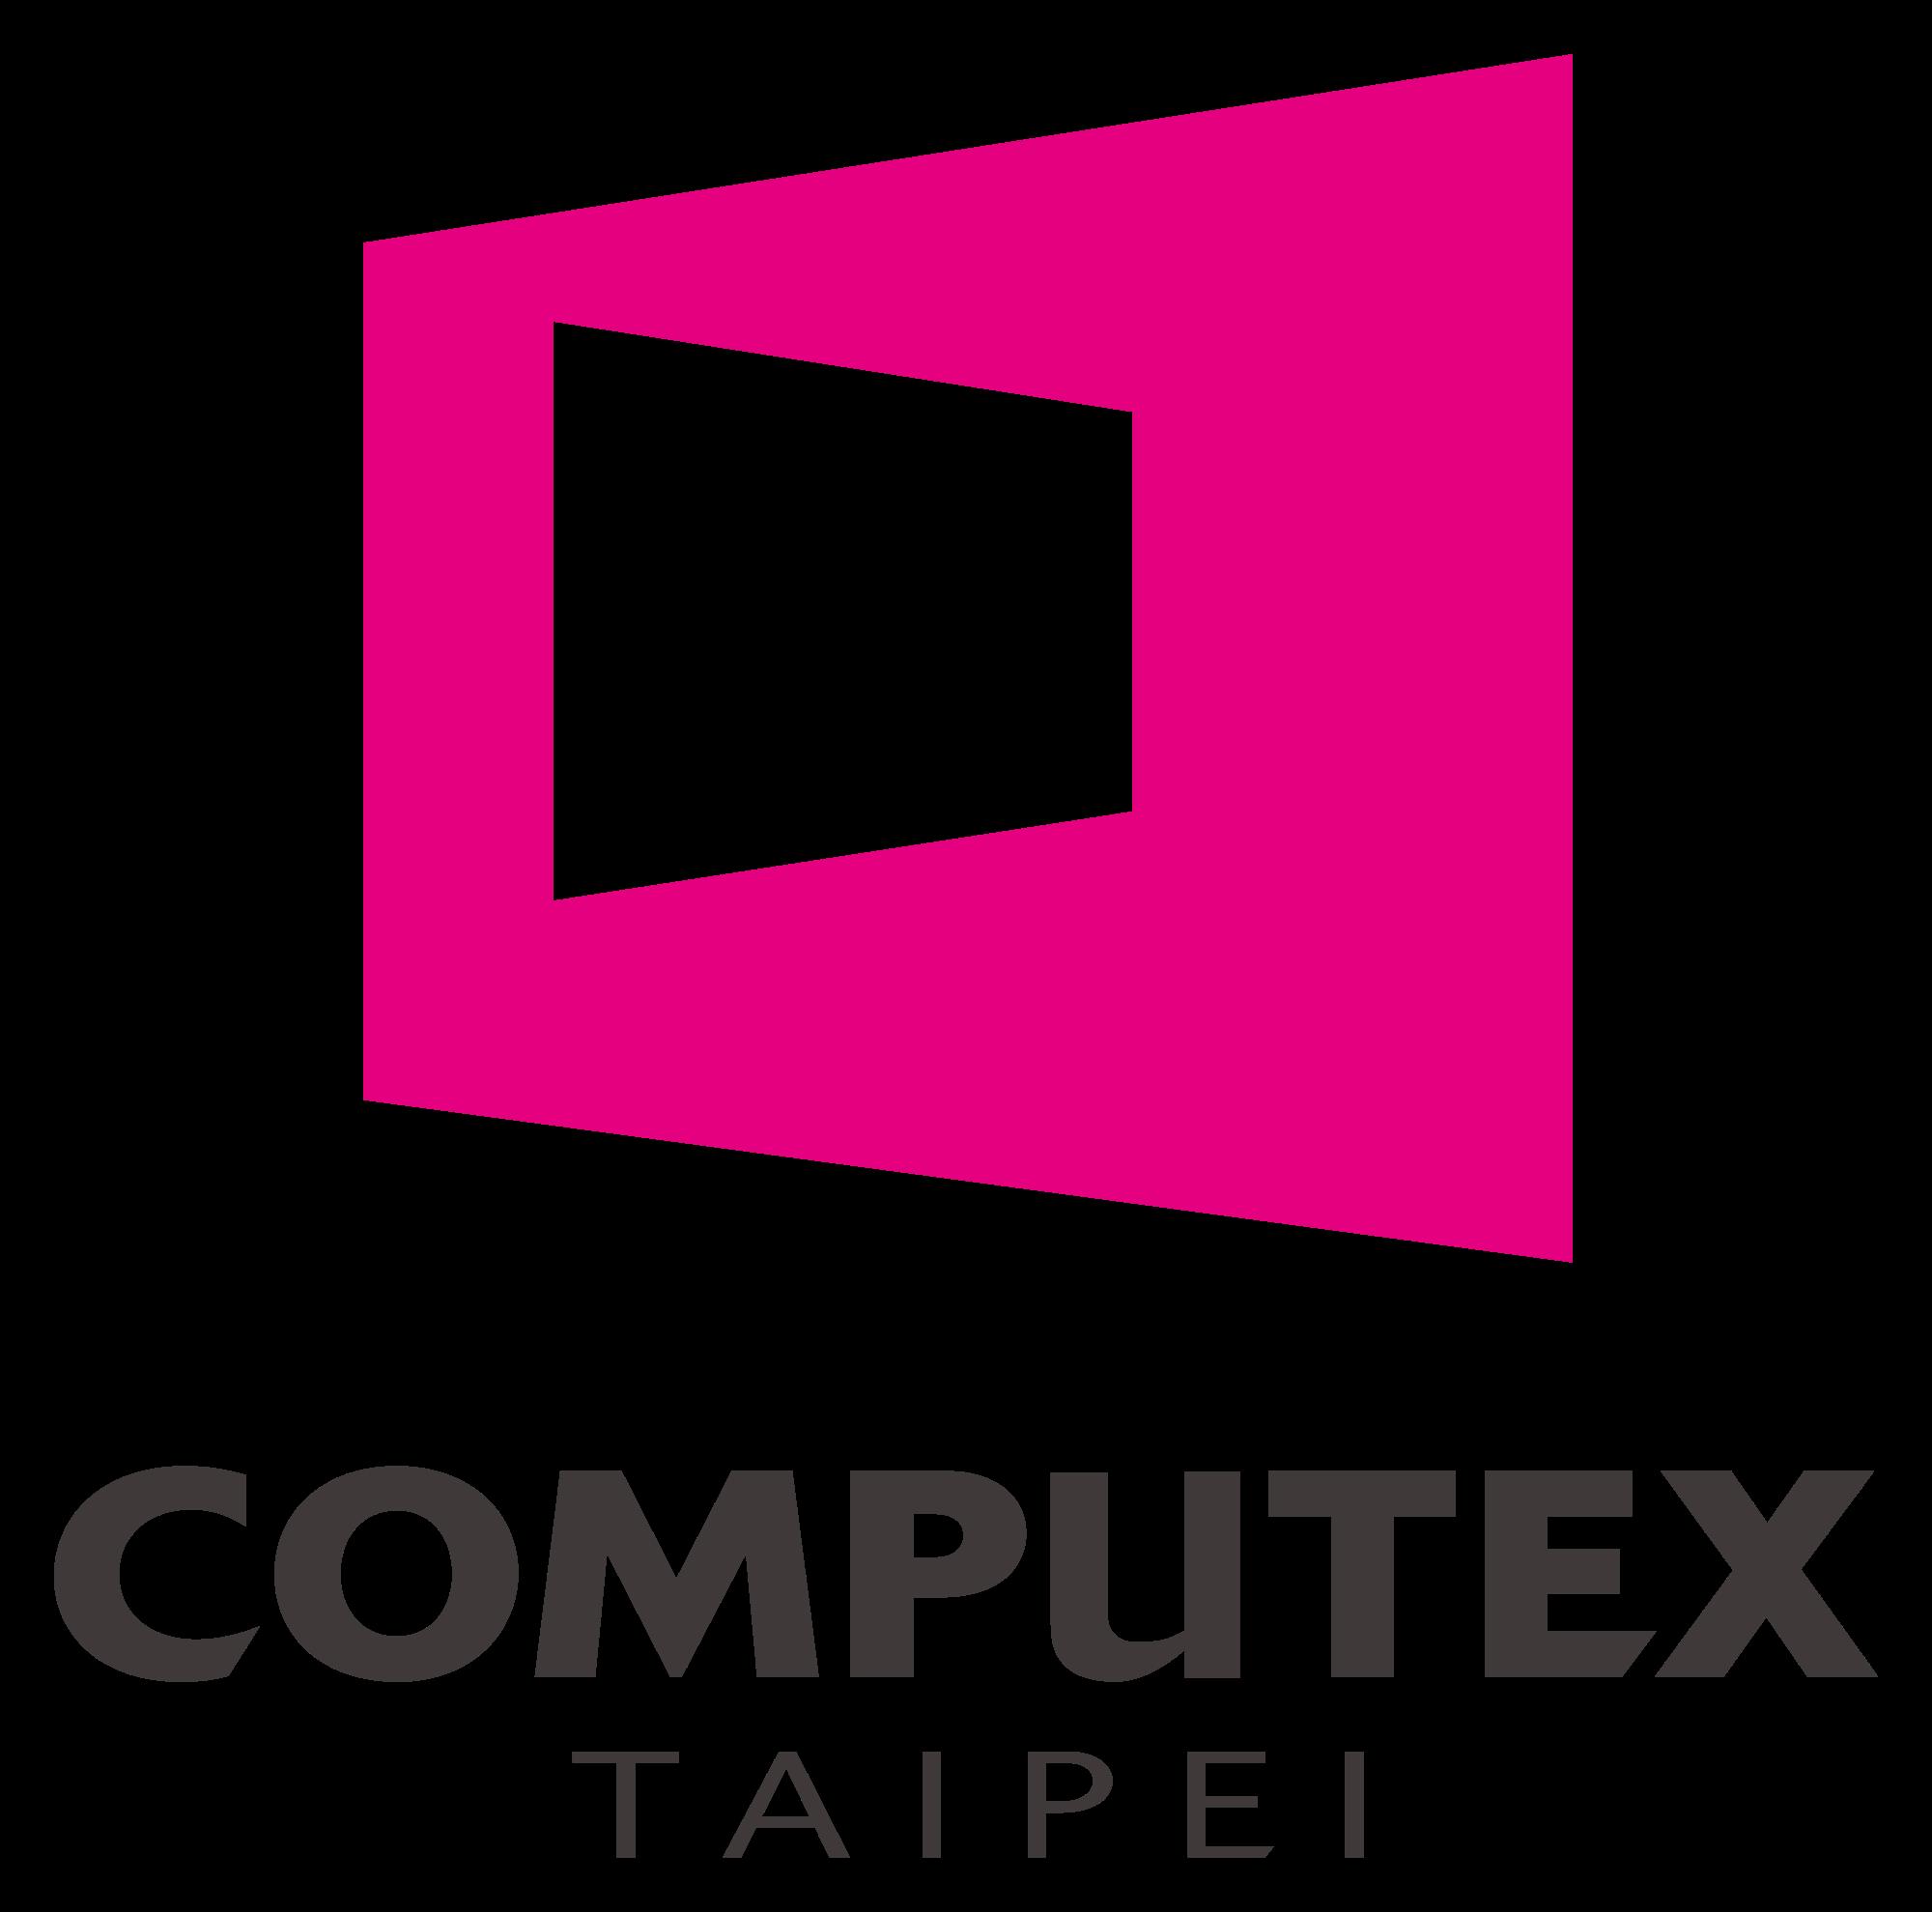 Computex logo